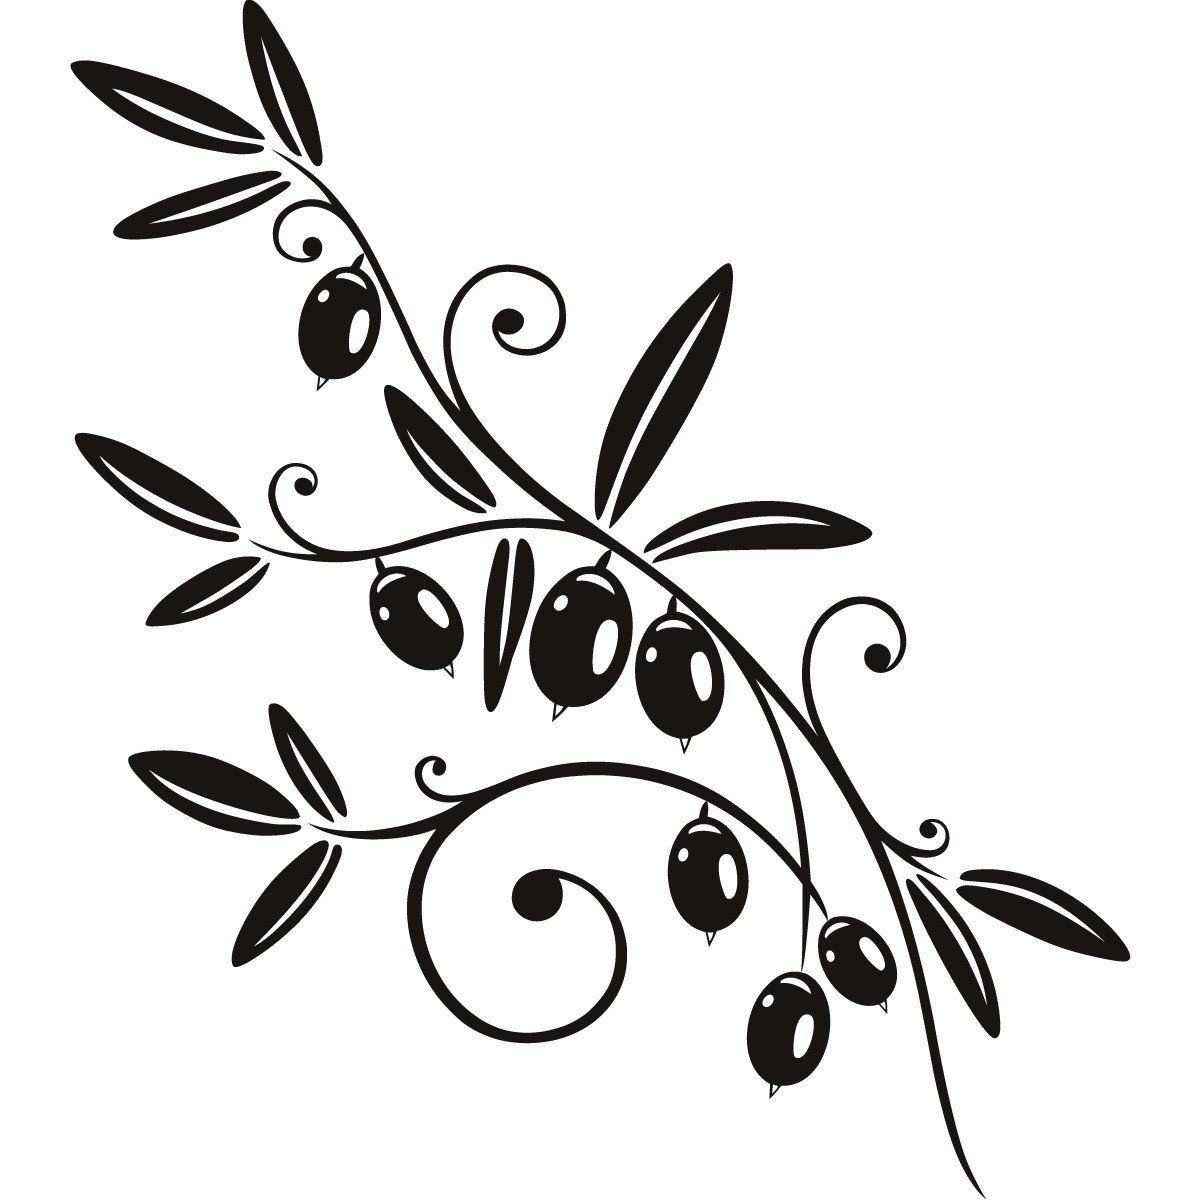 olivo dibujo buscar con google foodtruck olivo. Black Bedroom Furniture Sets. Home Design Ideas